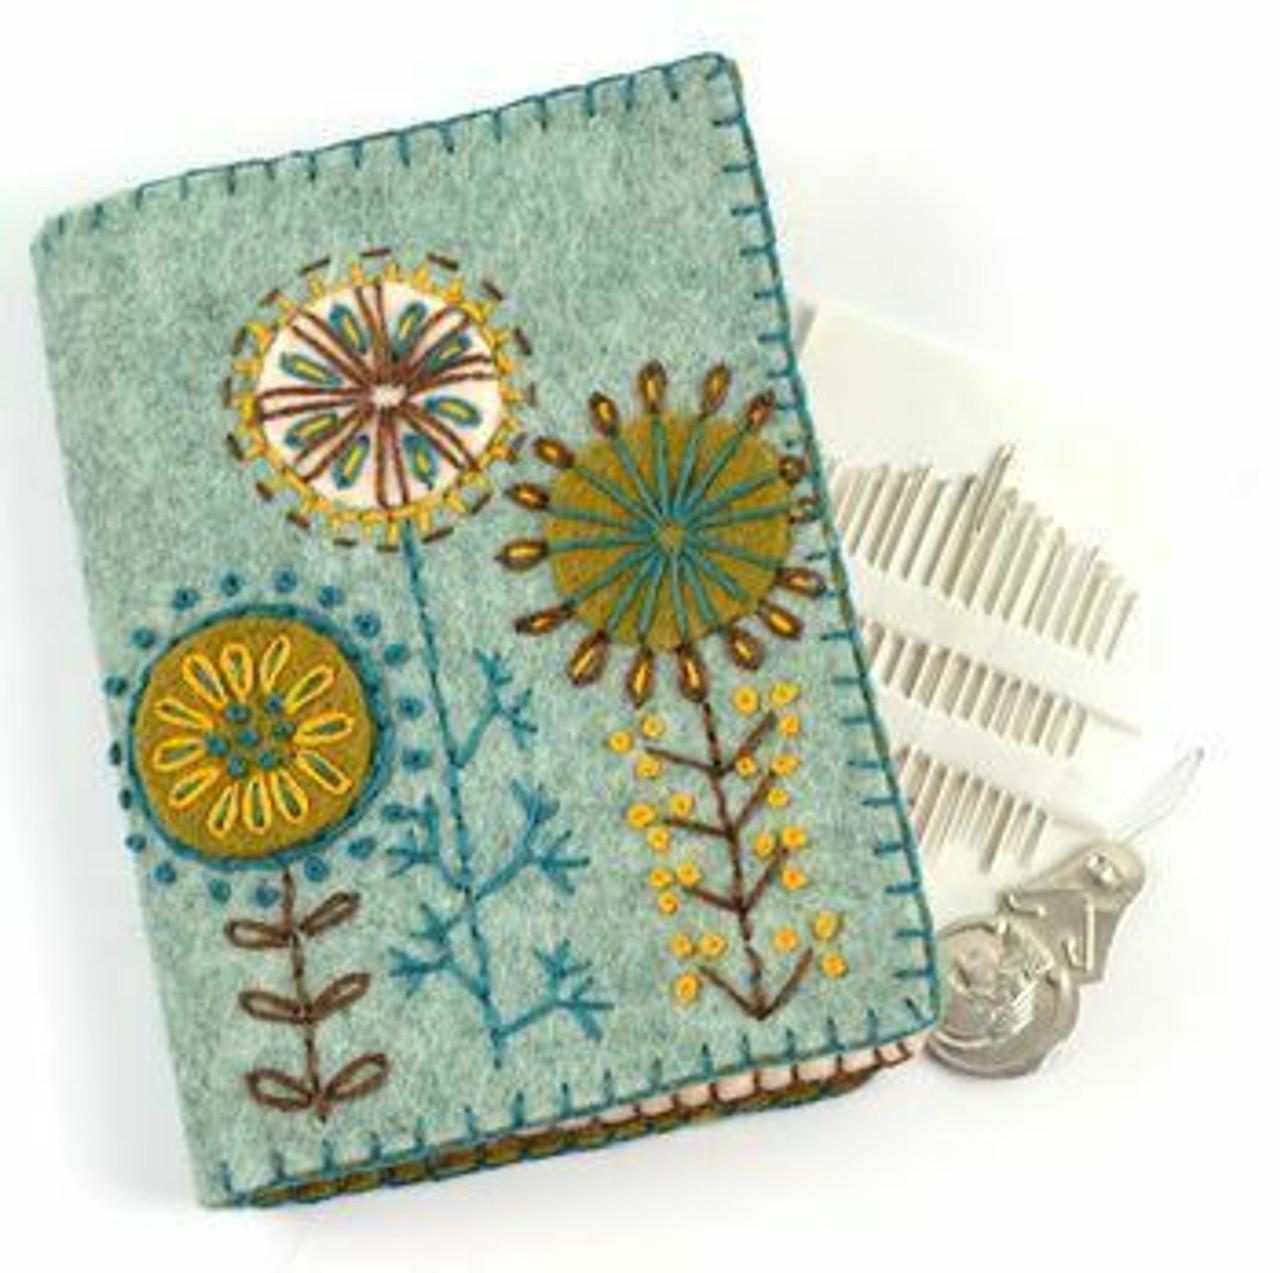 Needle Case Felt Embroidery Kit